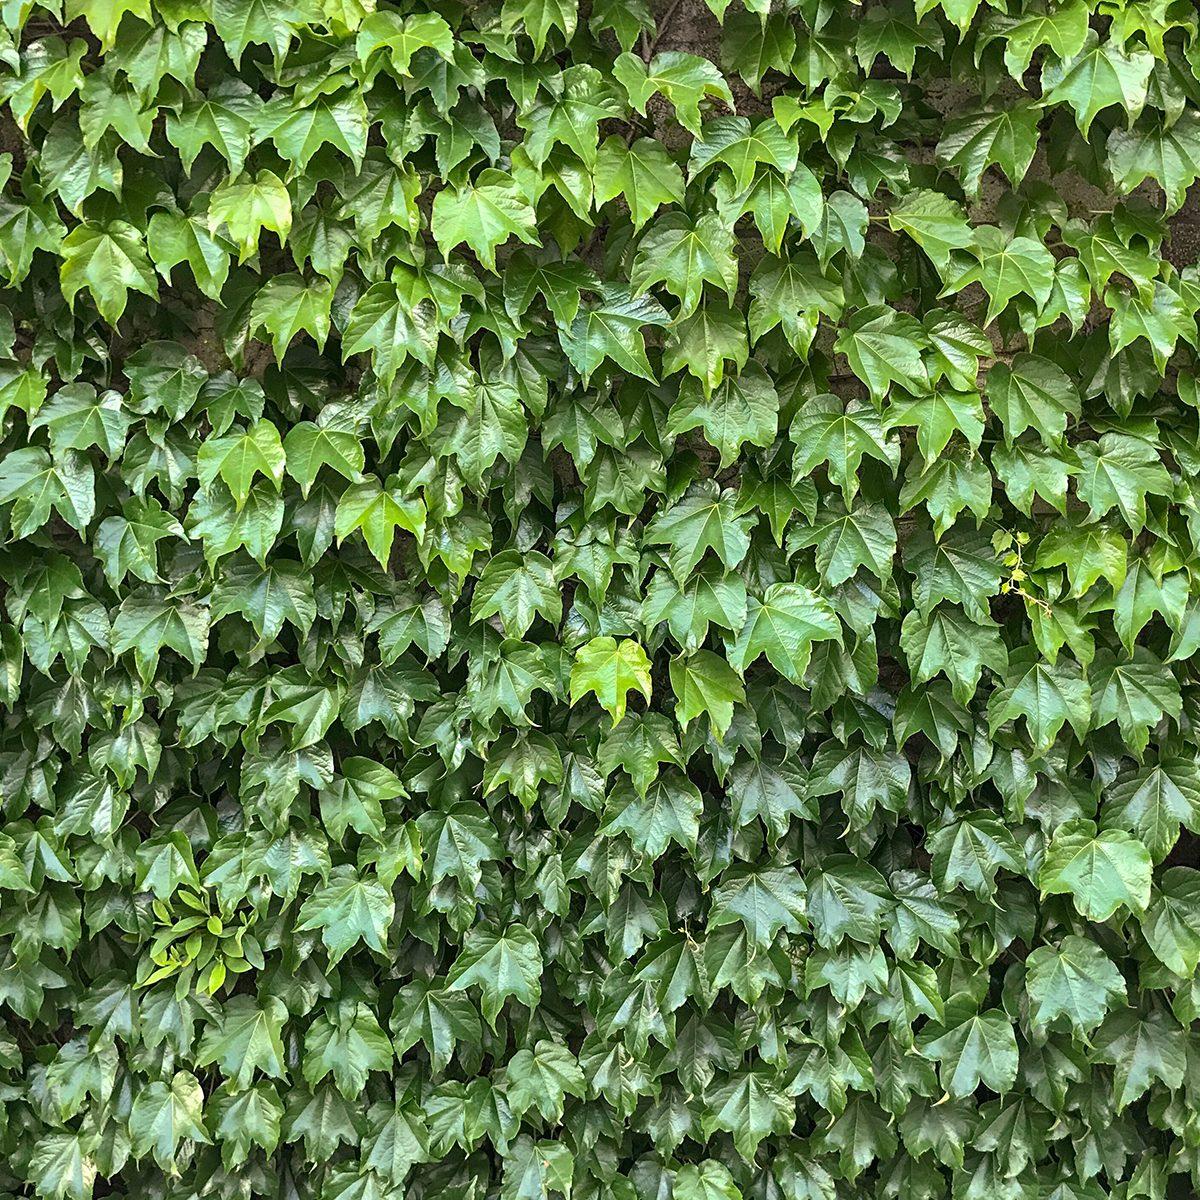 Fresh green leaves of boston ivy